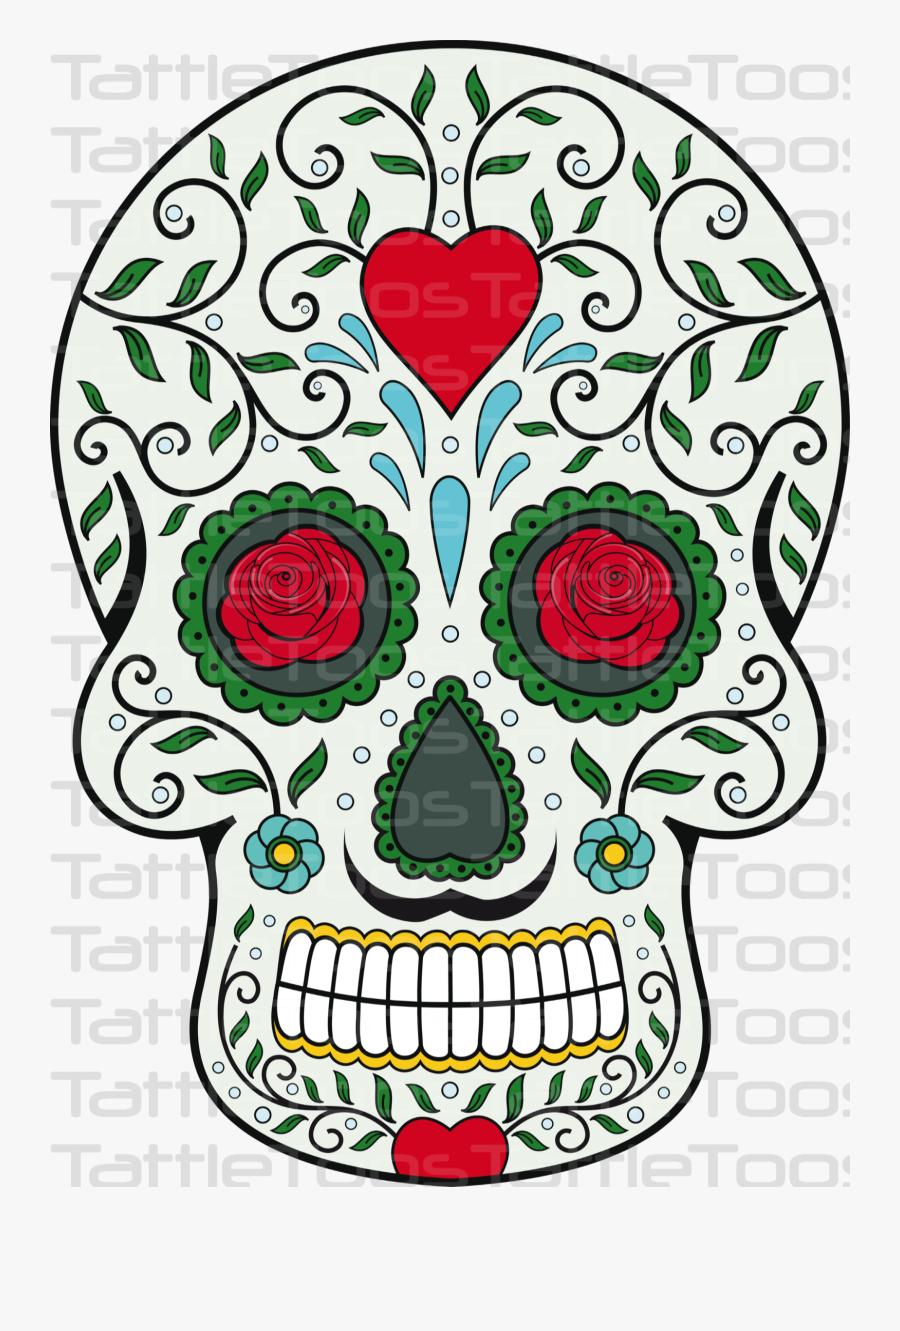 Transparent Day Of The Dead Clipart - Calavera Megico Png, Transparent Clipart